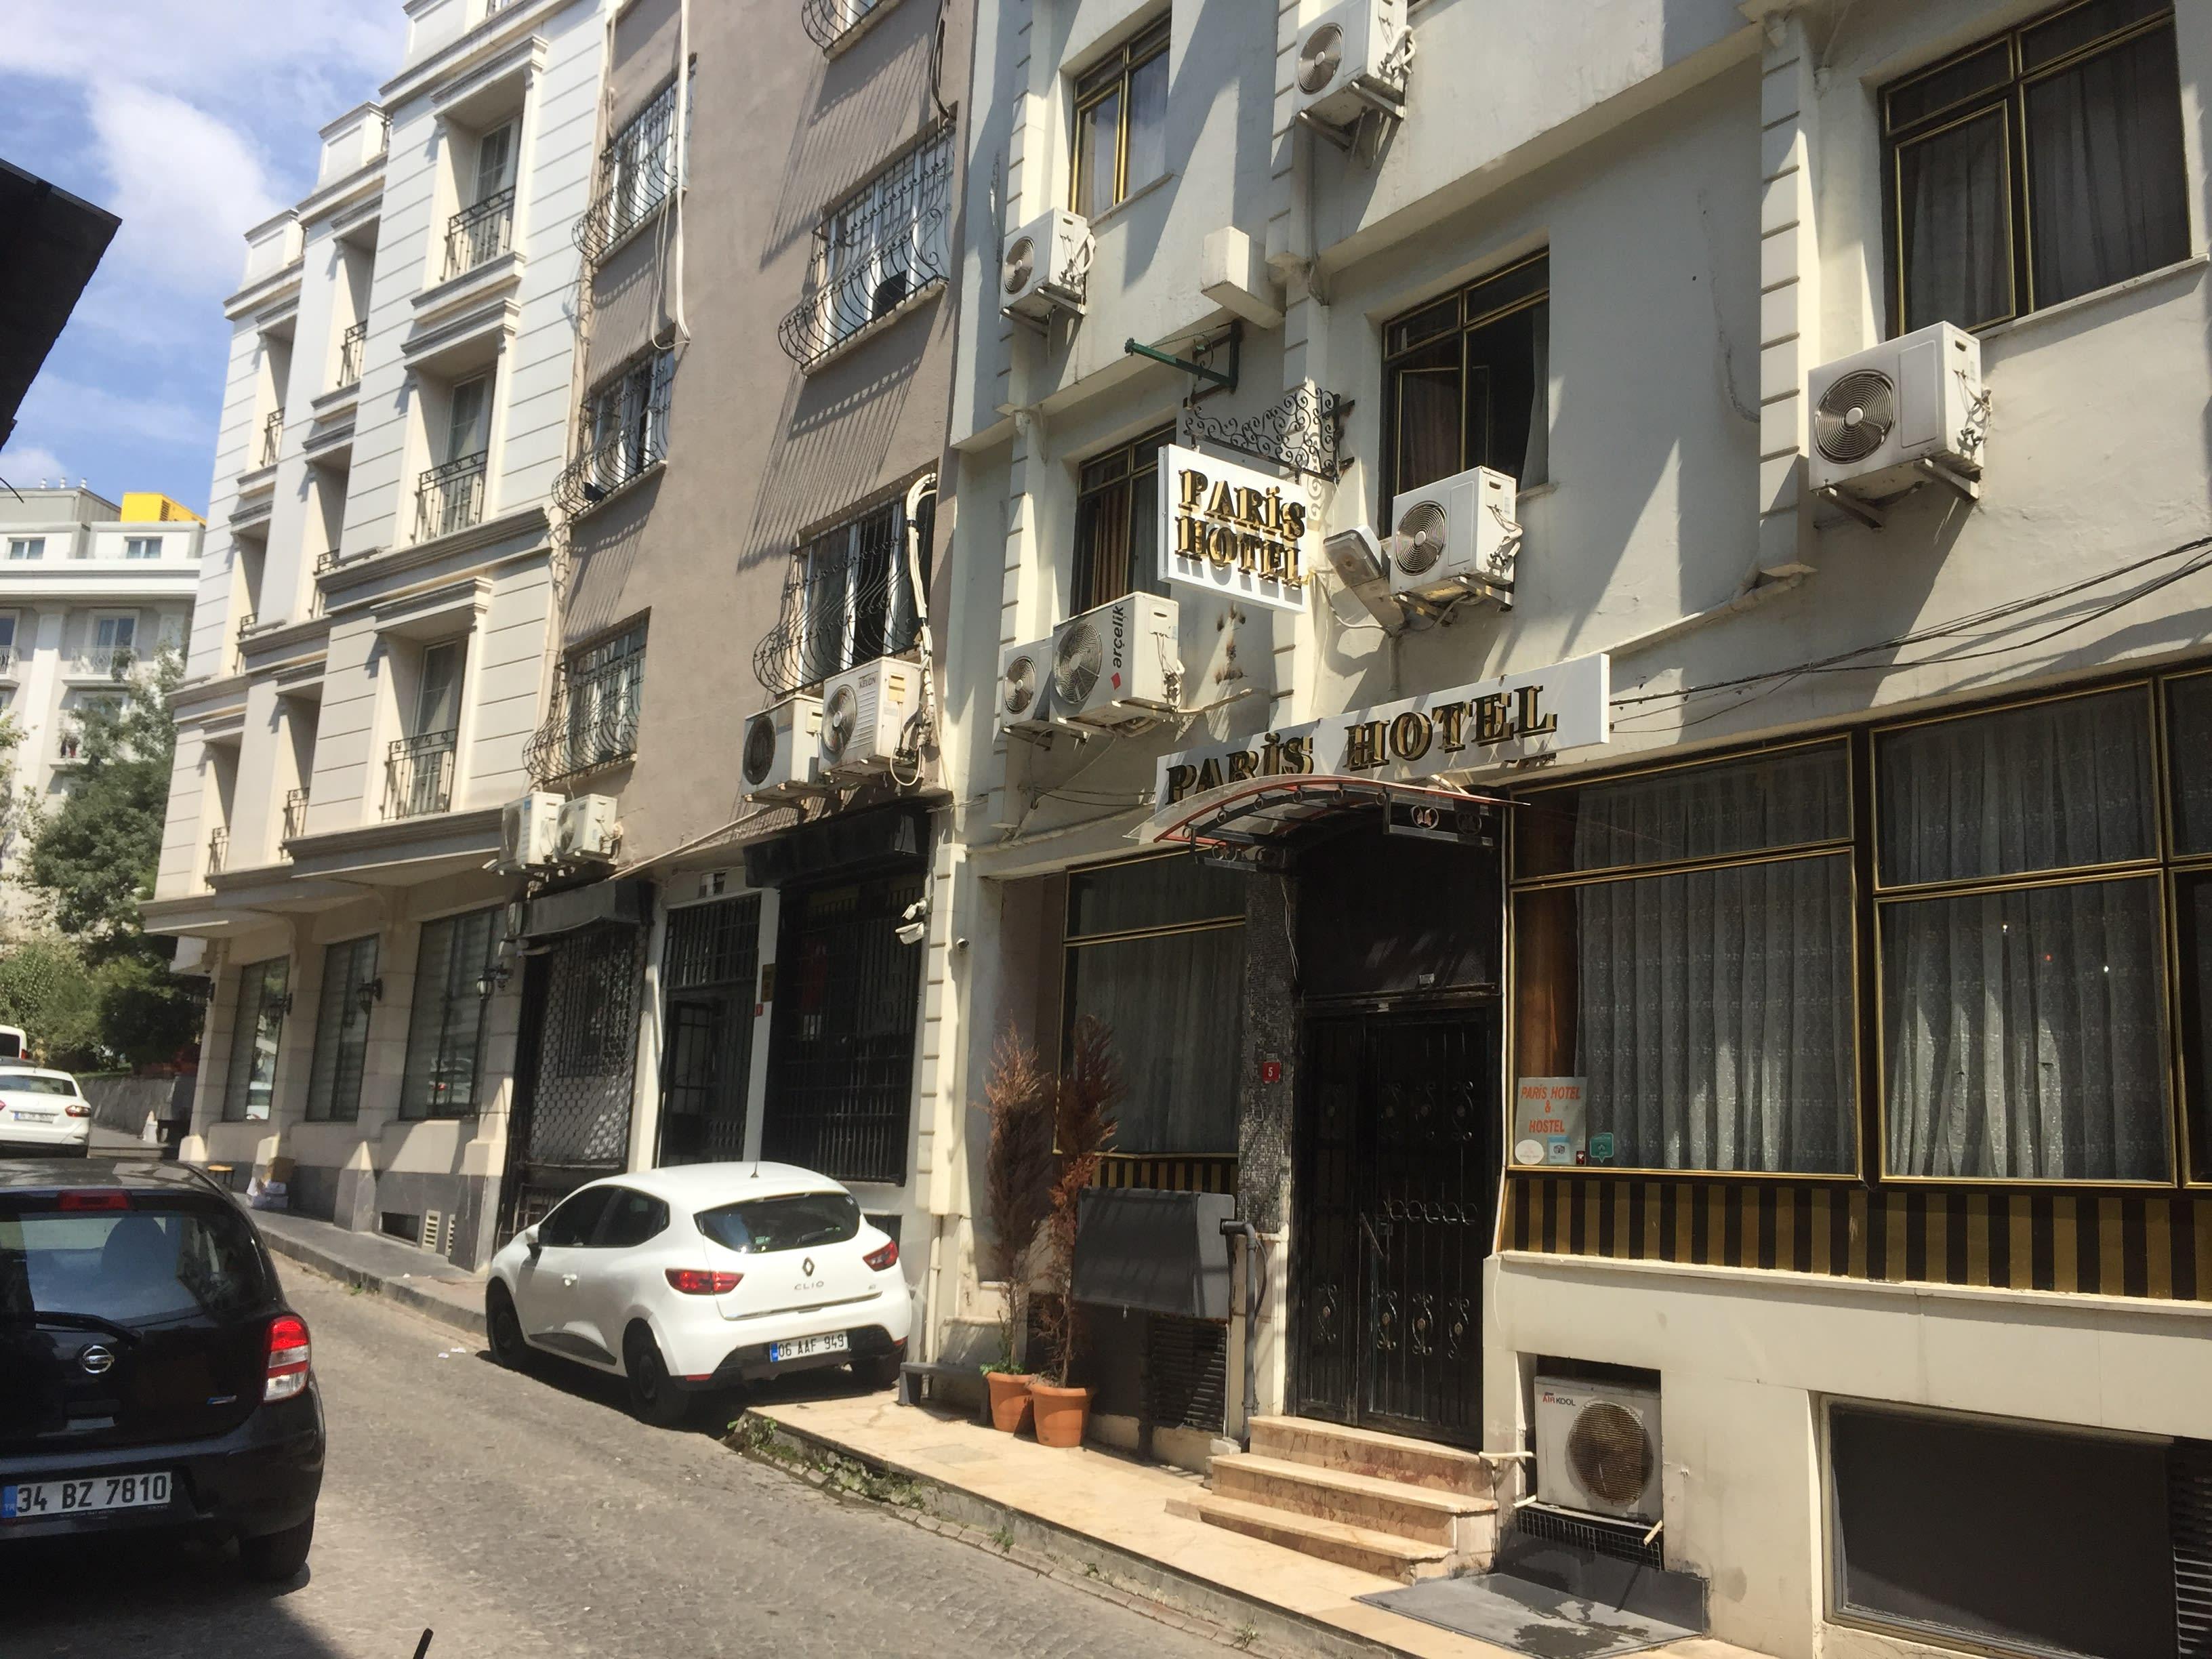 HOSTEL - Paris Hotel & Hostel